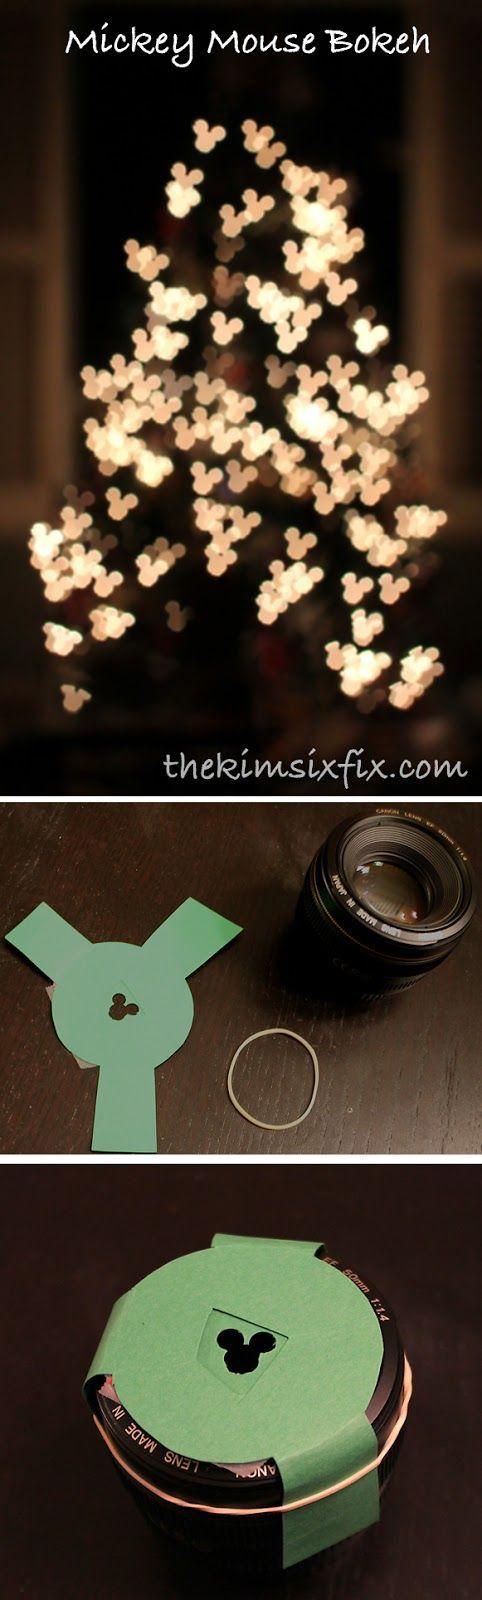 Mickey Bokeh for Night Photography at Disney | The Kim Six Fix #TheKimSixFix